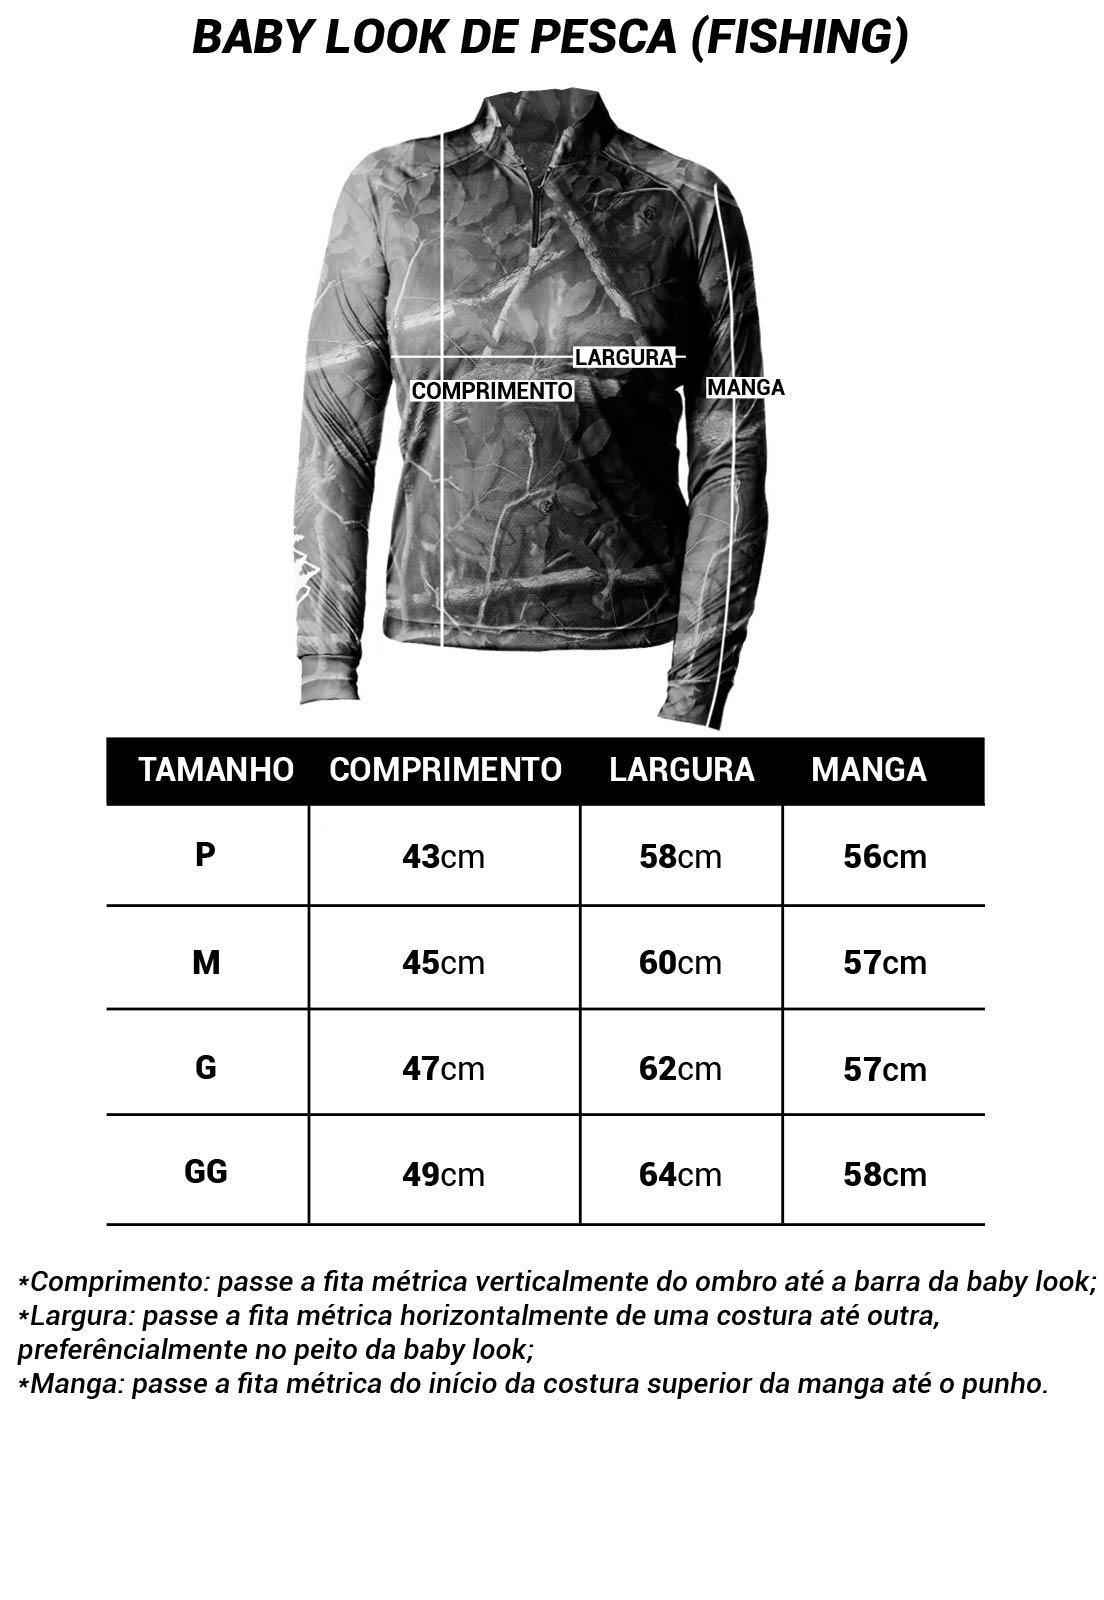 CAMISA DE PESCA FISH CAMUFLADA URBANO BLACK 36 FEMININA + BANDANA GRÁTIS  - REAL HUNTER OUTDOORS